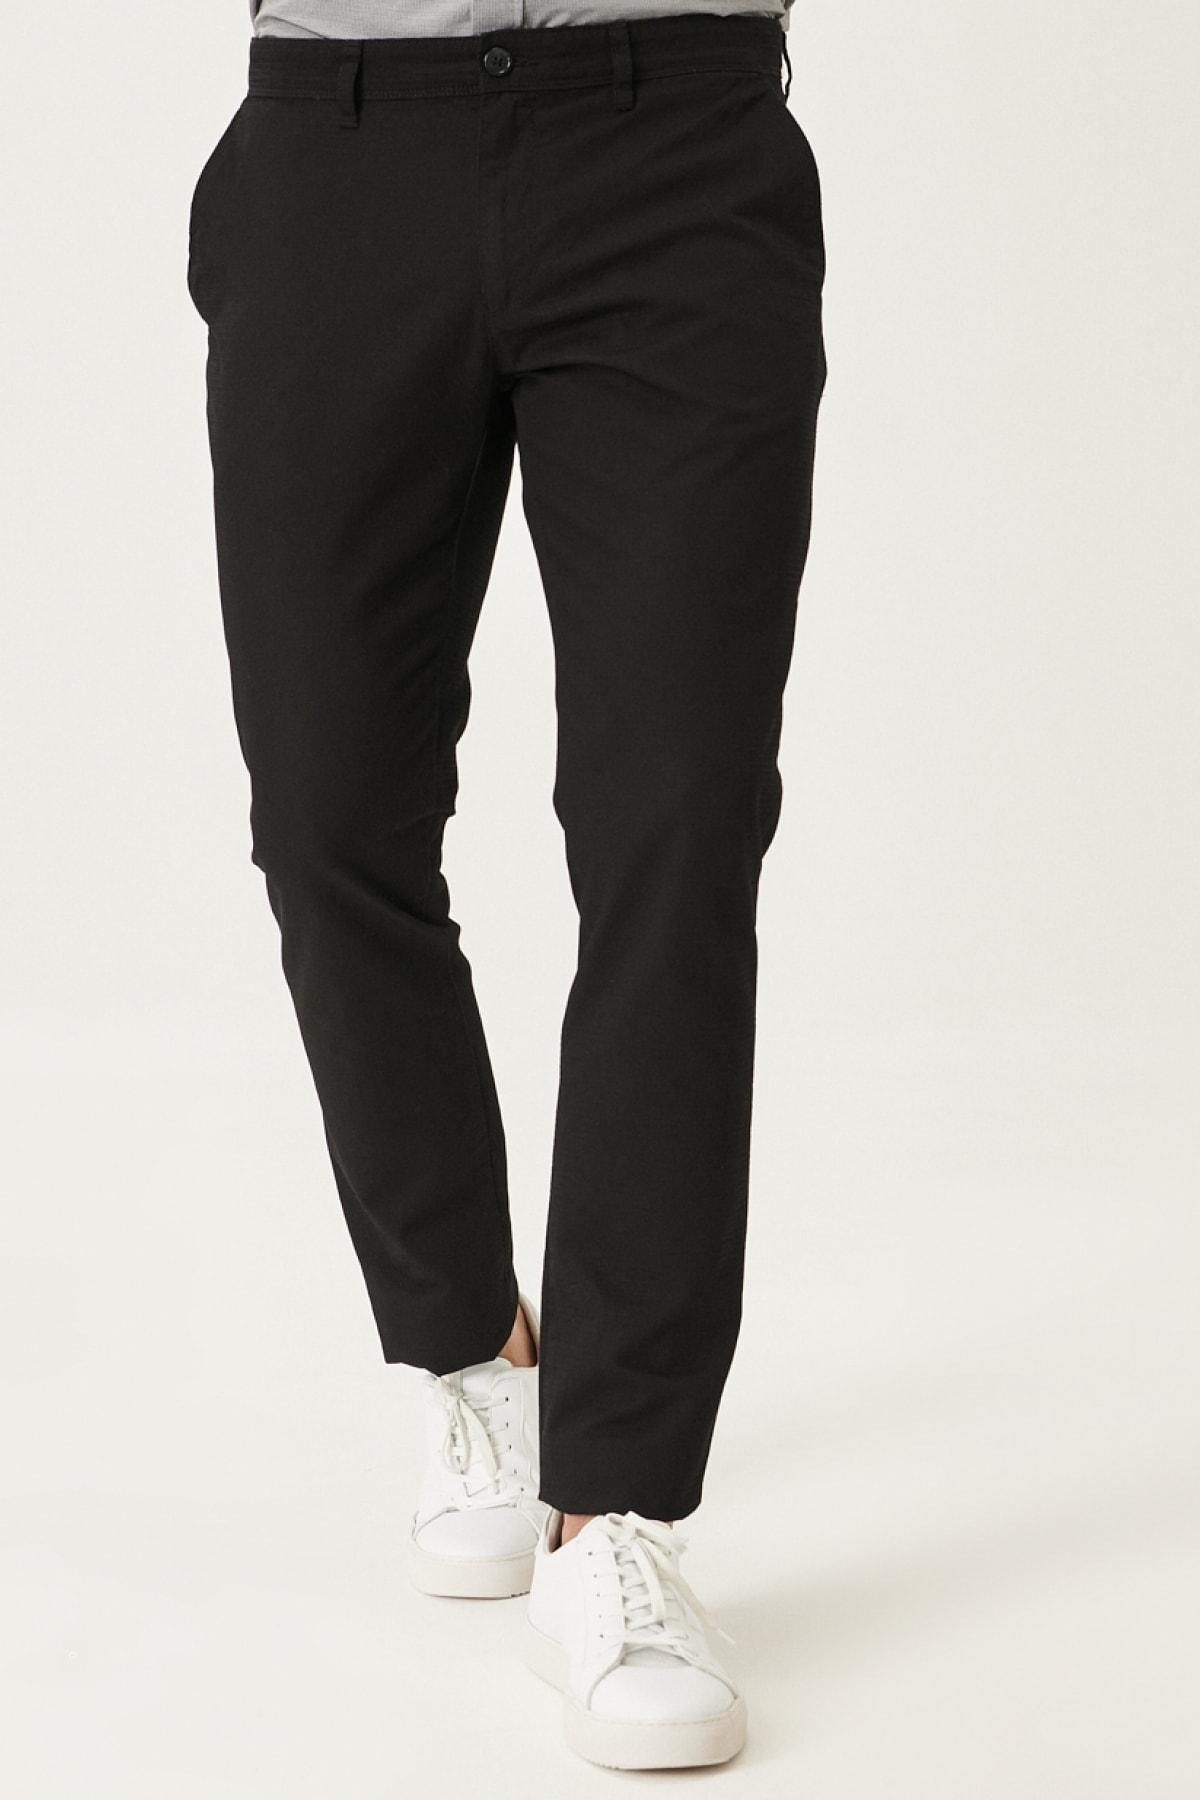 Kanvas Slim Fit Dar Kesim Yan Cep %100 Koton Chino Pantolon